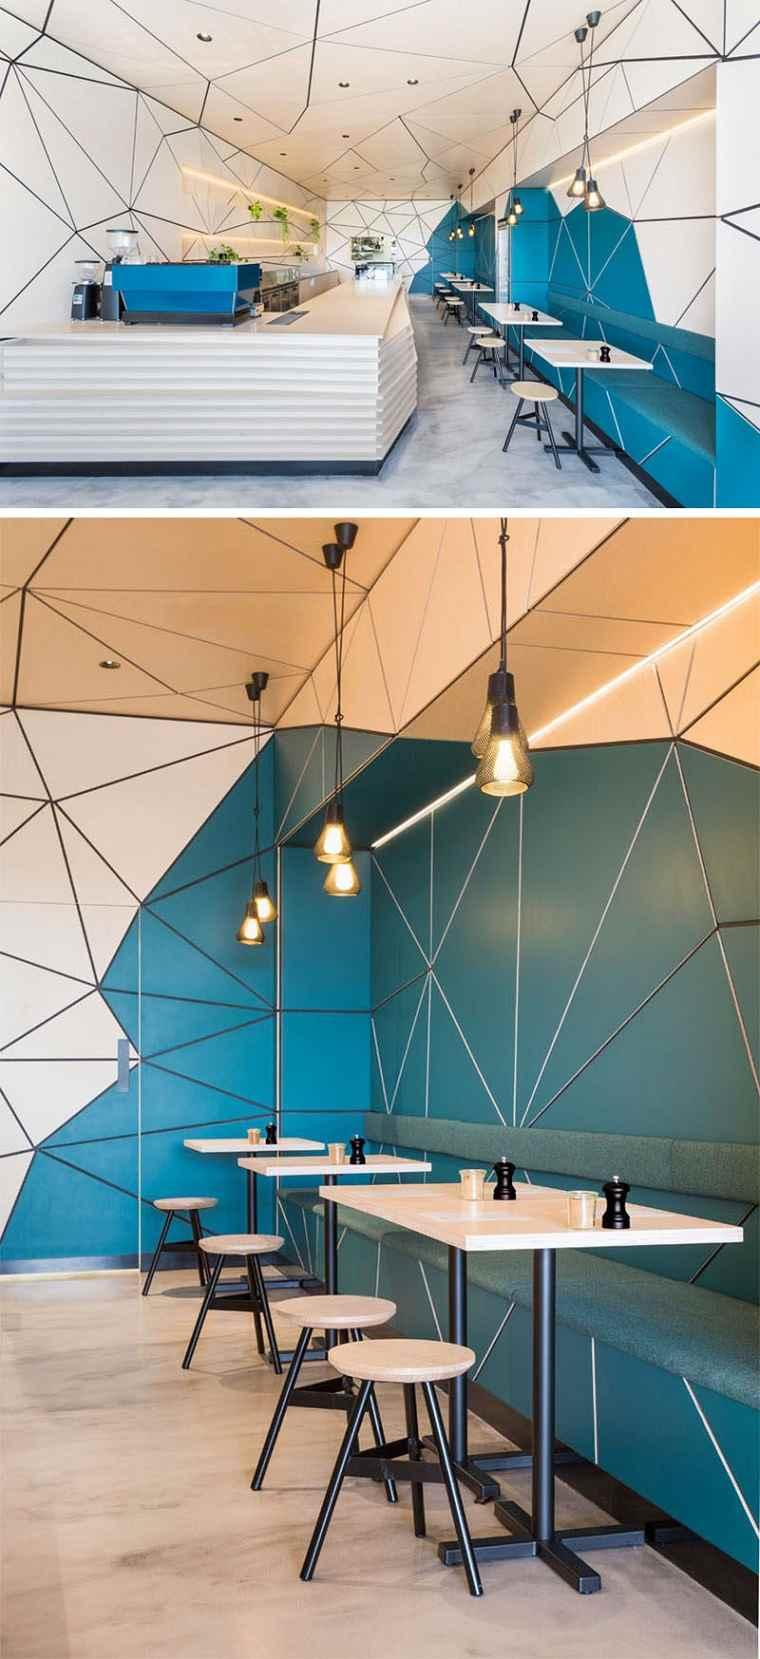 cafeterias con encanto pequeno lugar diseno ideas